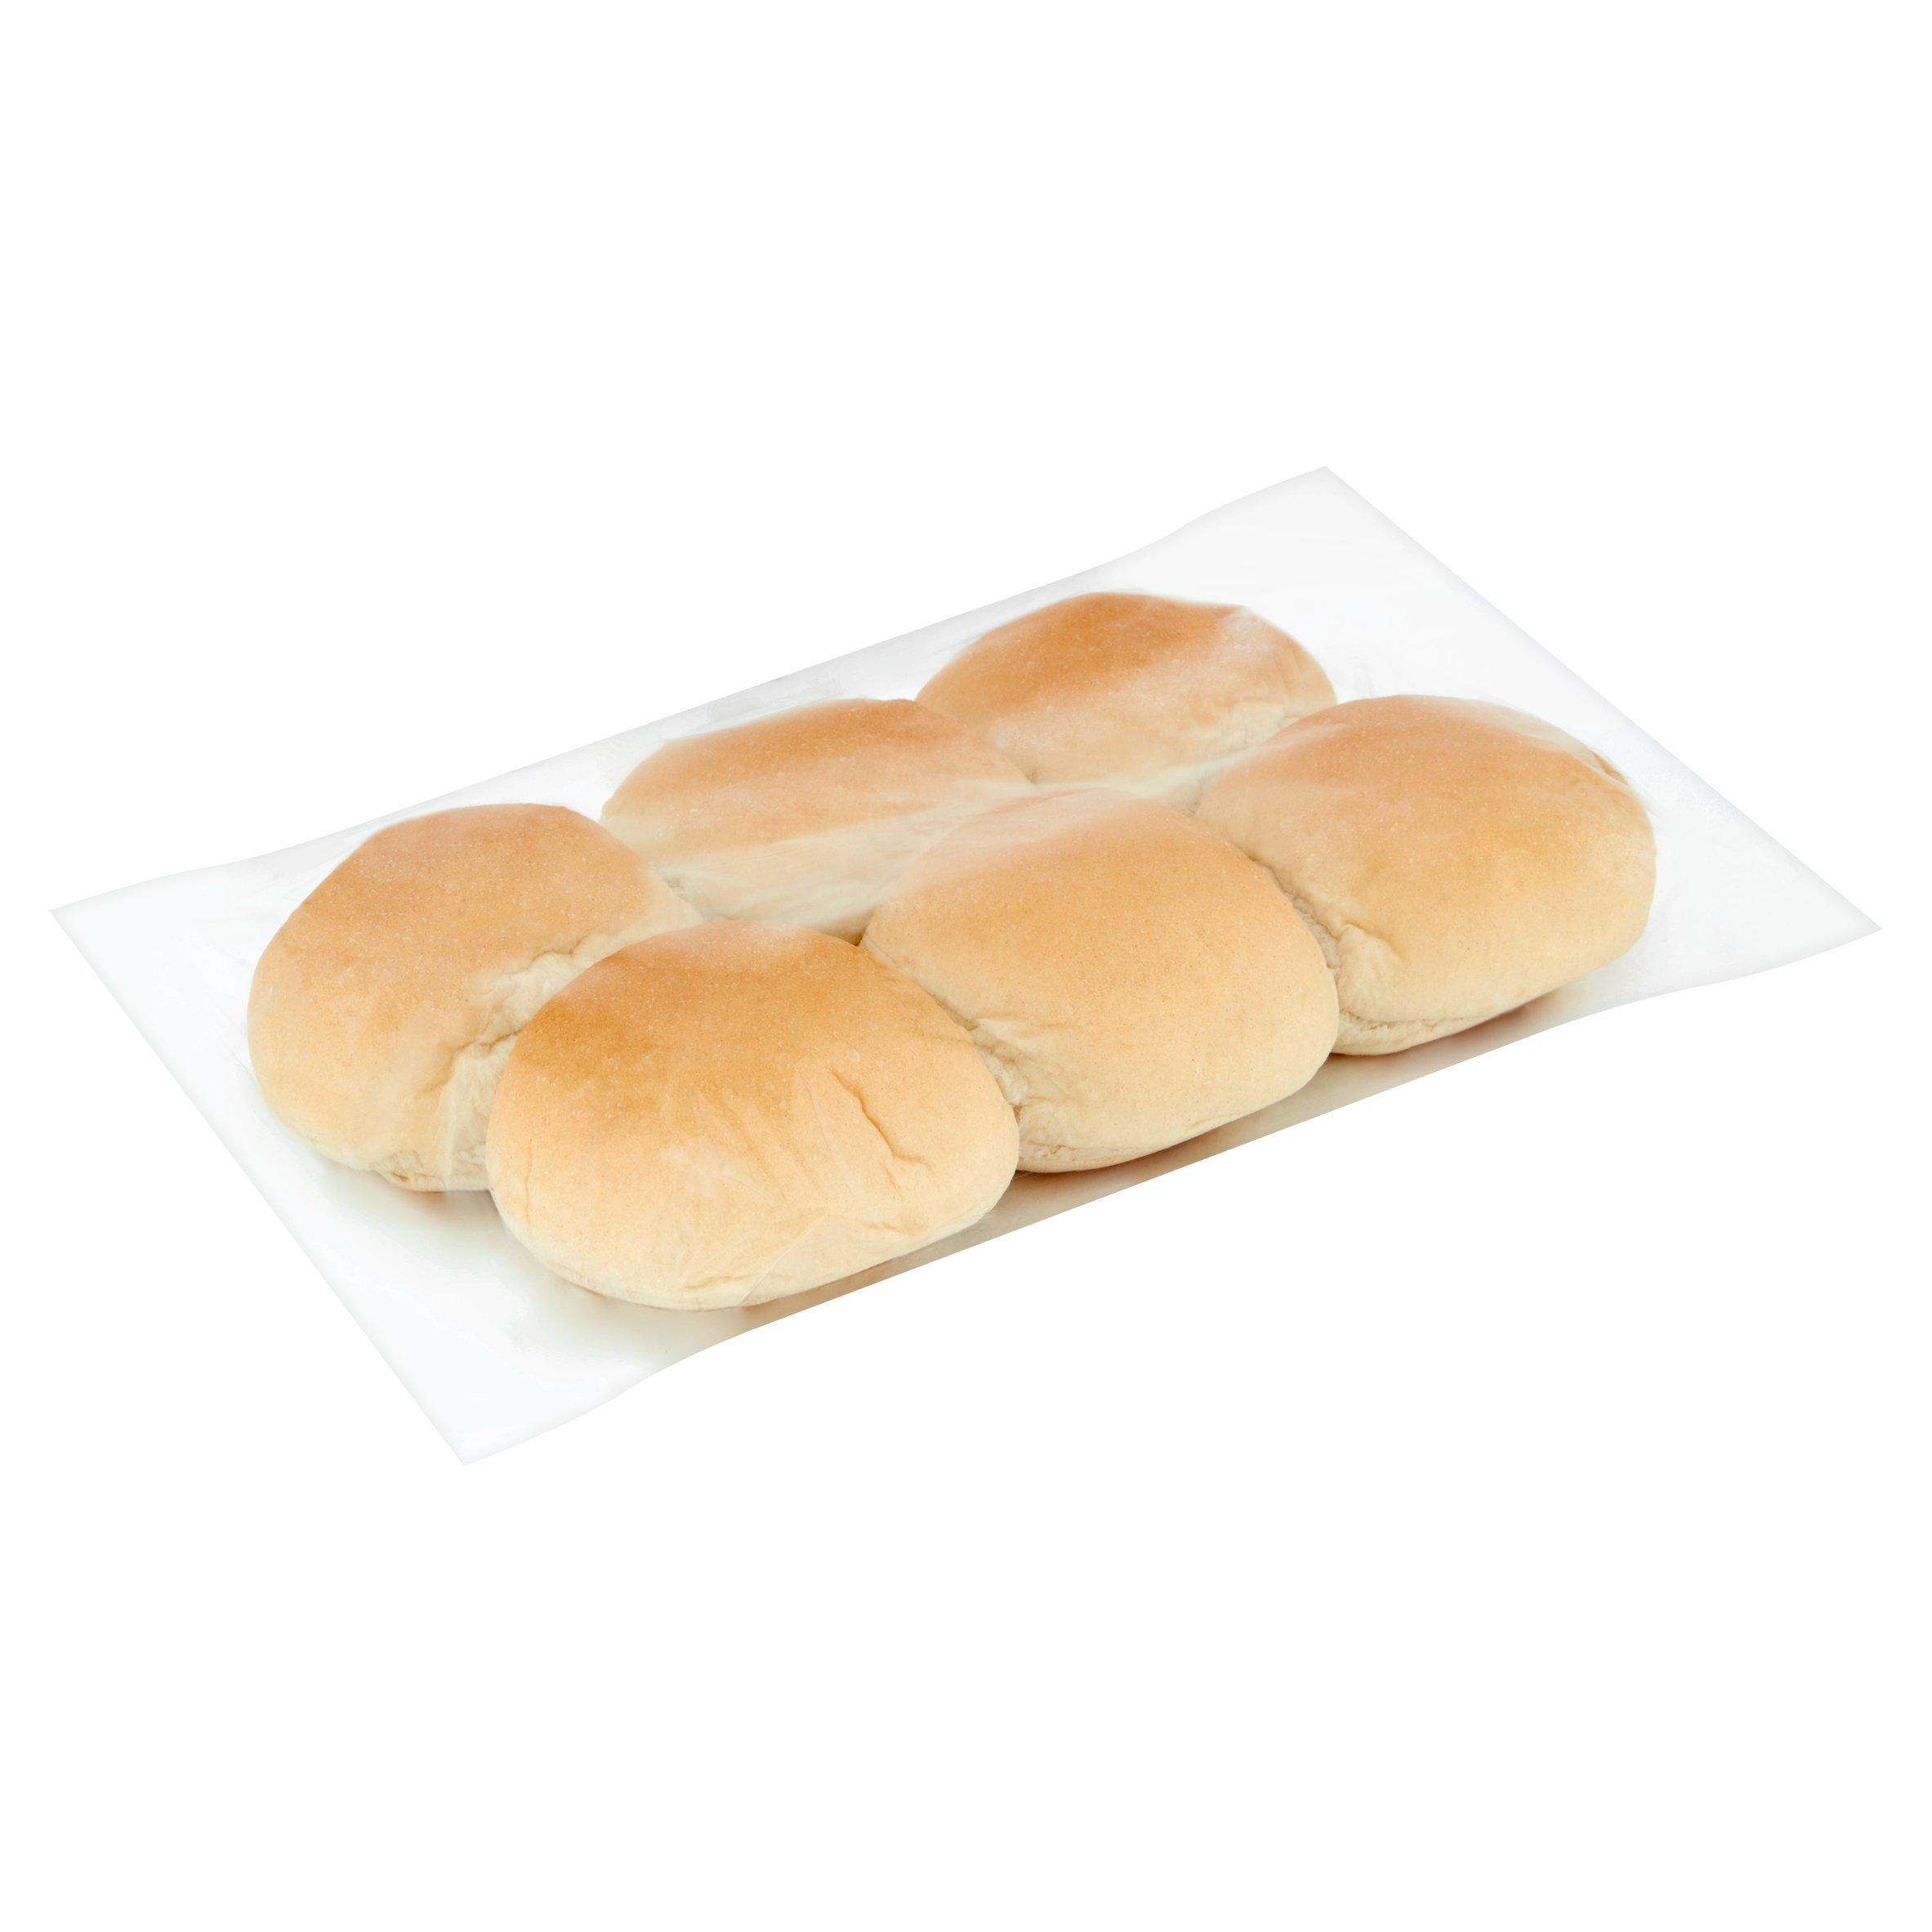 Big Bite Soft White Roll 6Pack